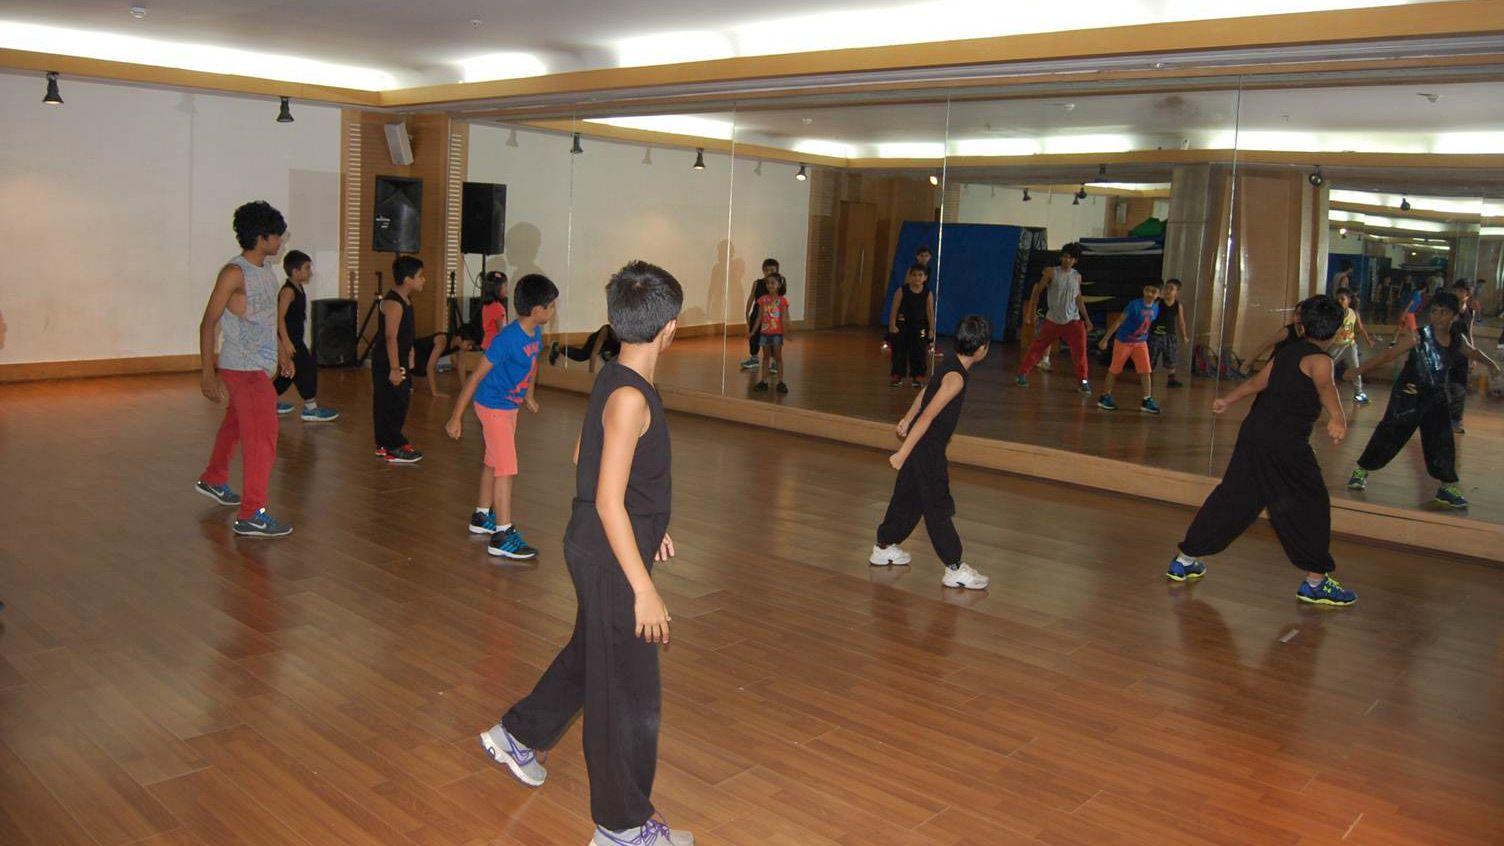 Dancers practicing at a Bollywood studio in mumbai